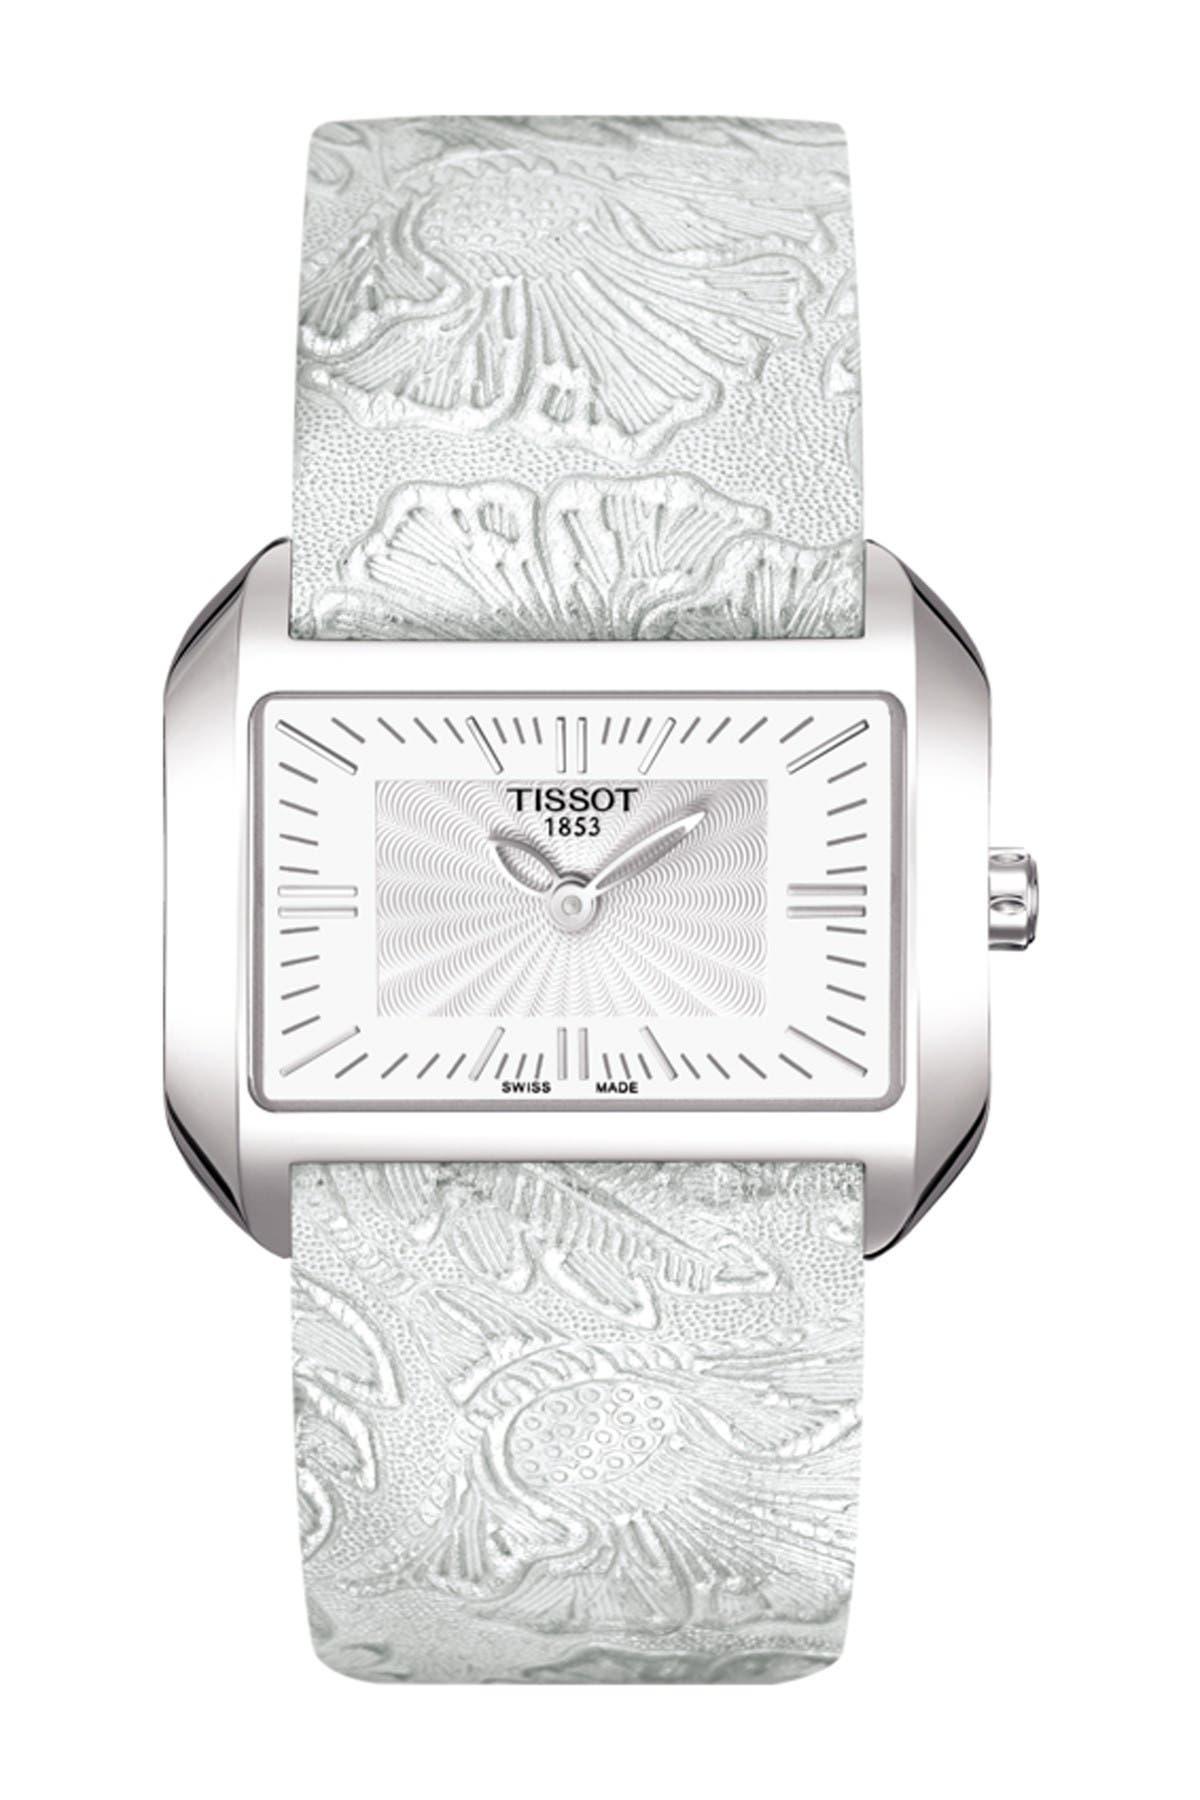 Image of Tissot Women's T-Wave Watch, 20.2mm